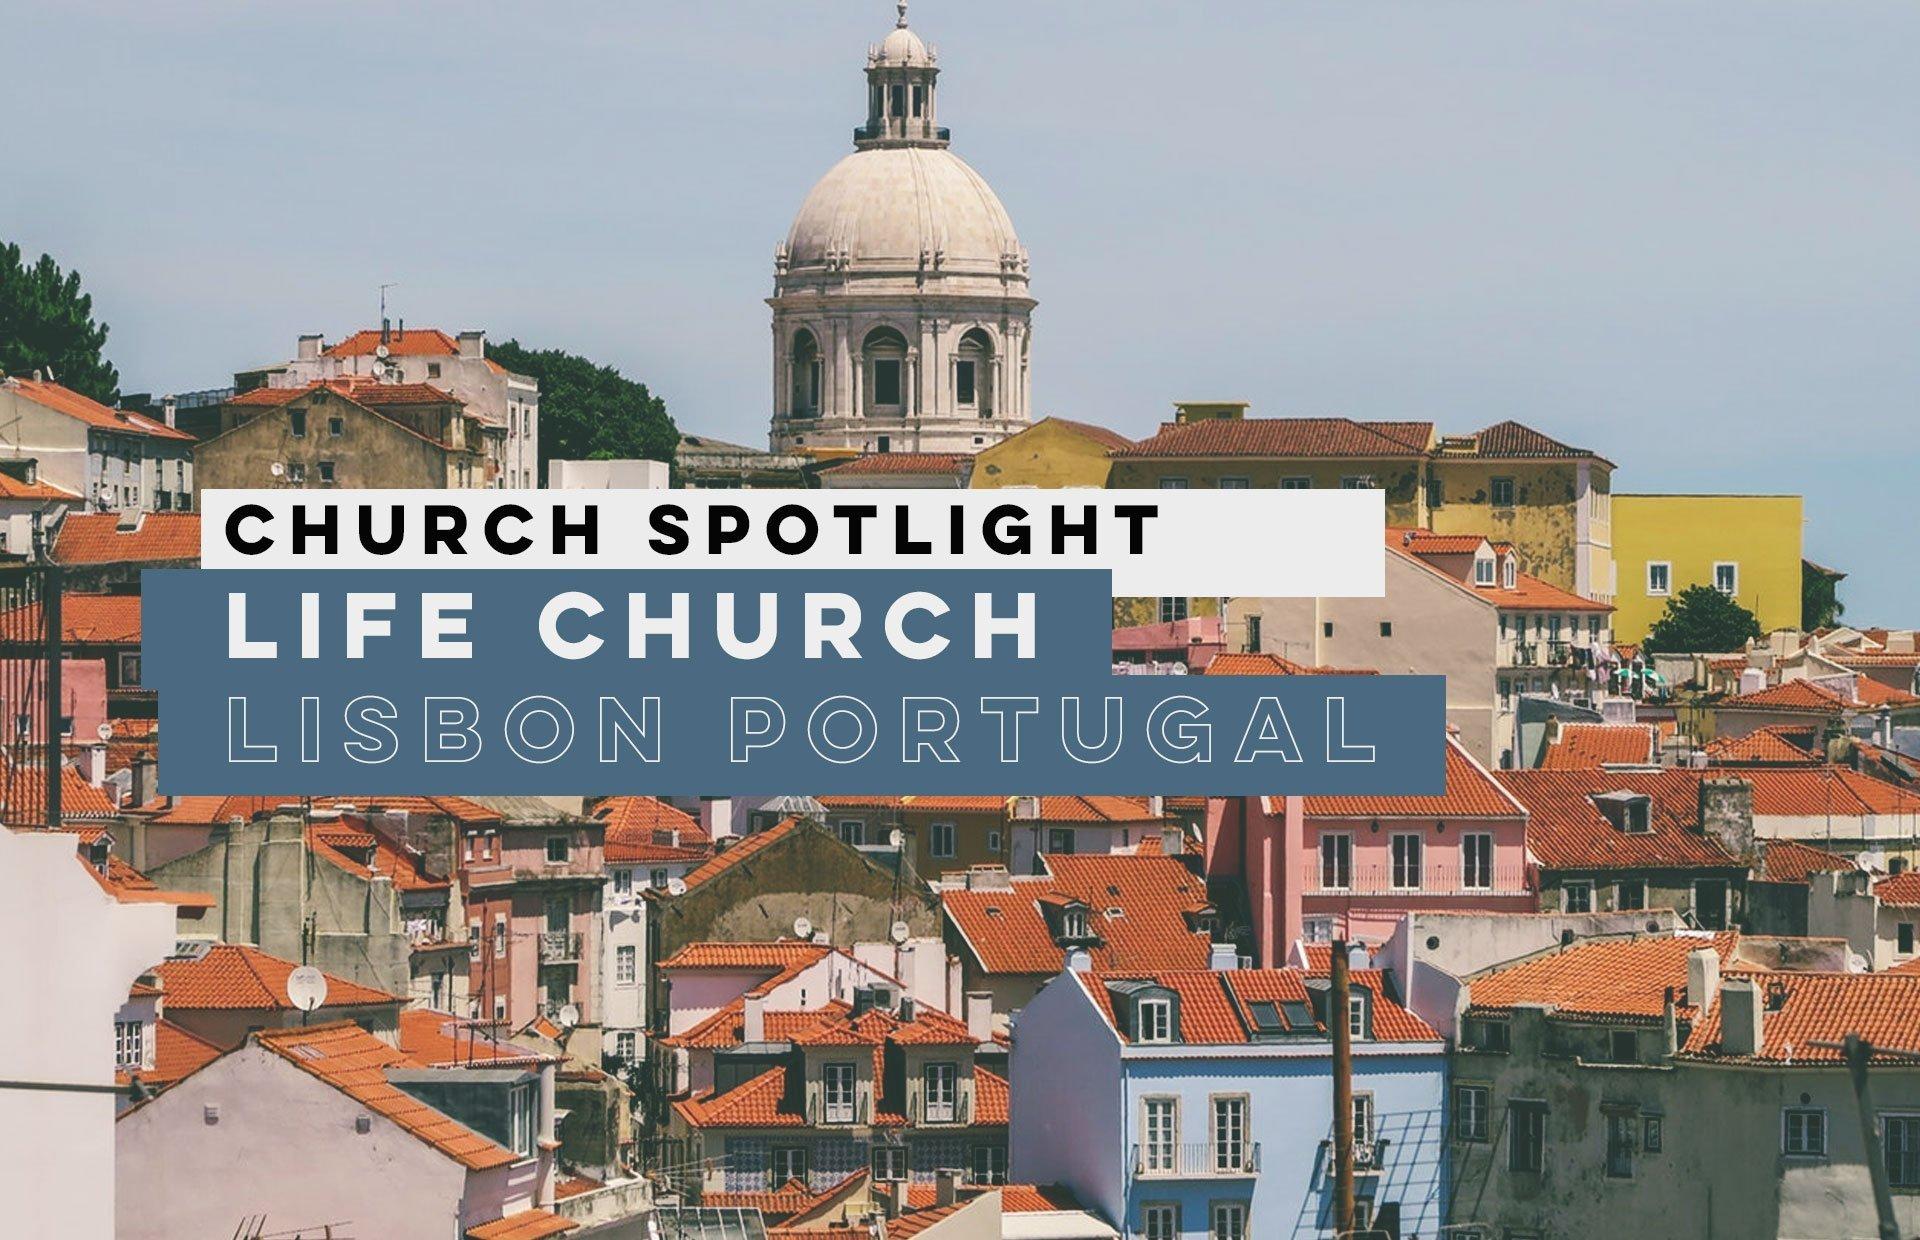 LIFE CHURCH, LISBON PORTUGAL